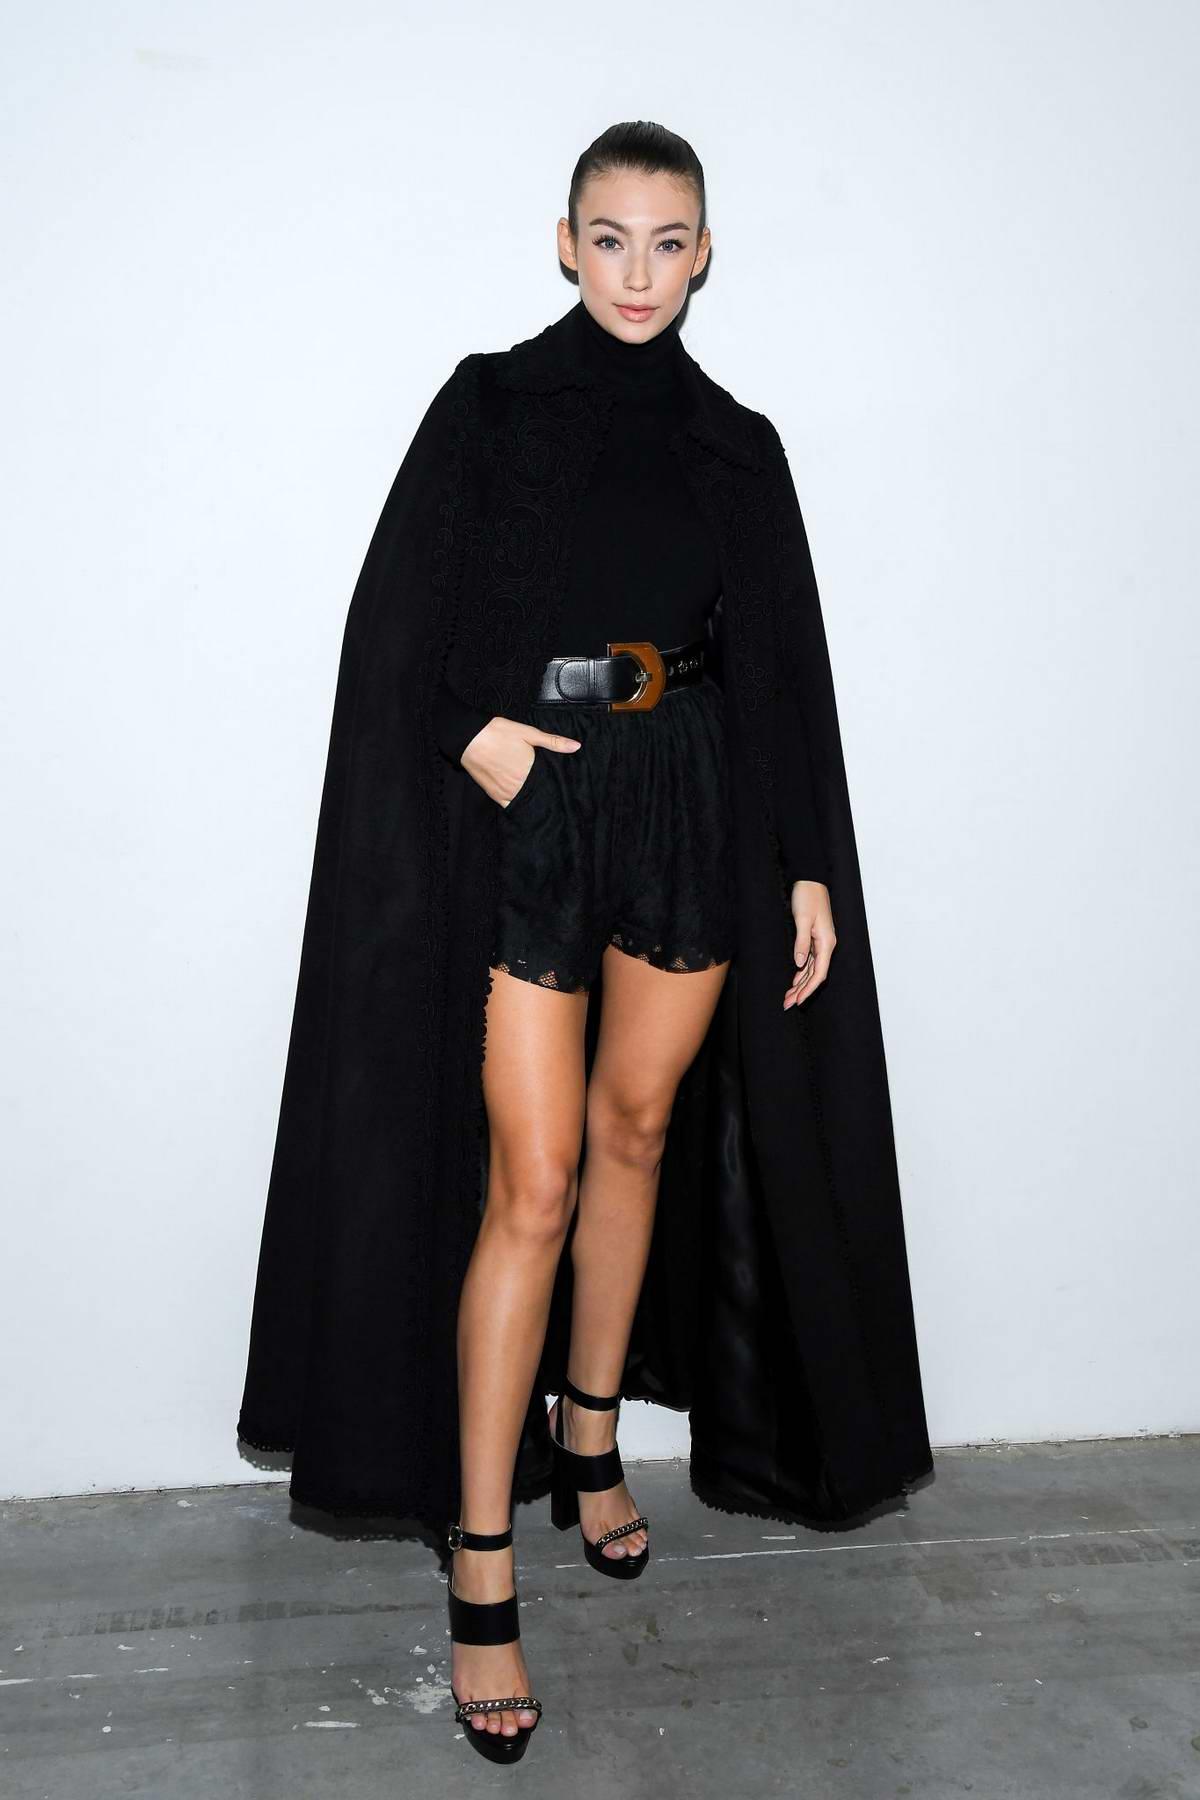 Lorena Rae attends the Elie Saab fashion show, F/W 2020 during Paris Fashion Week in Paris, France